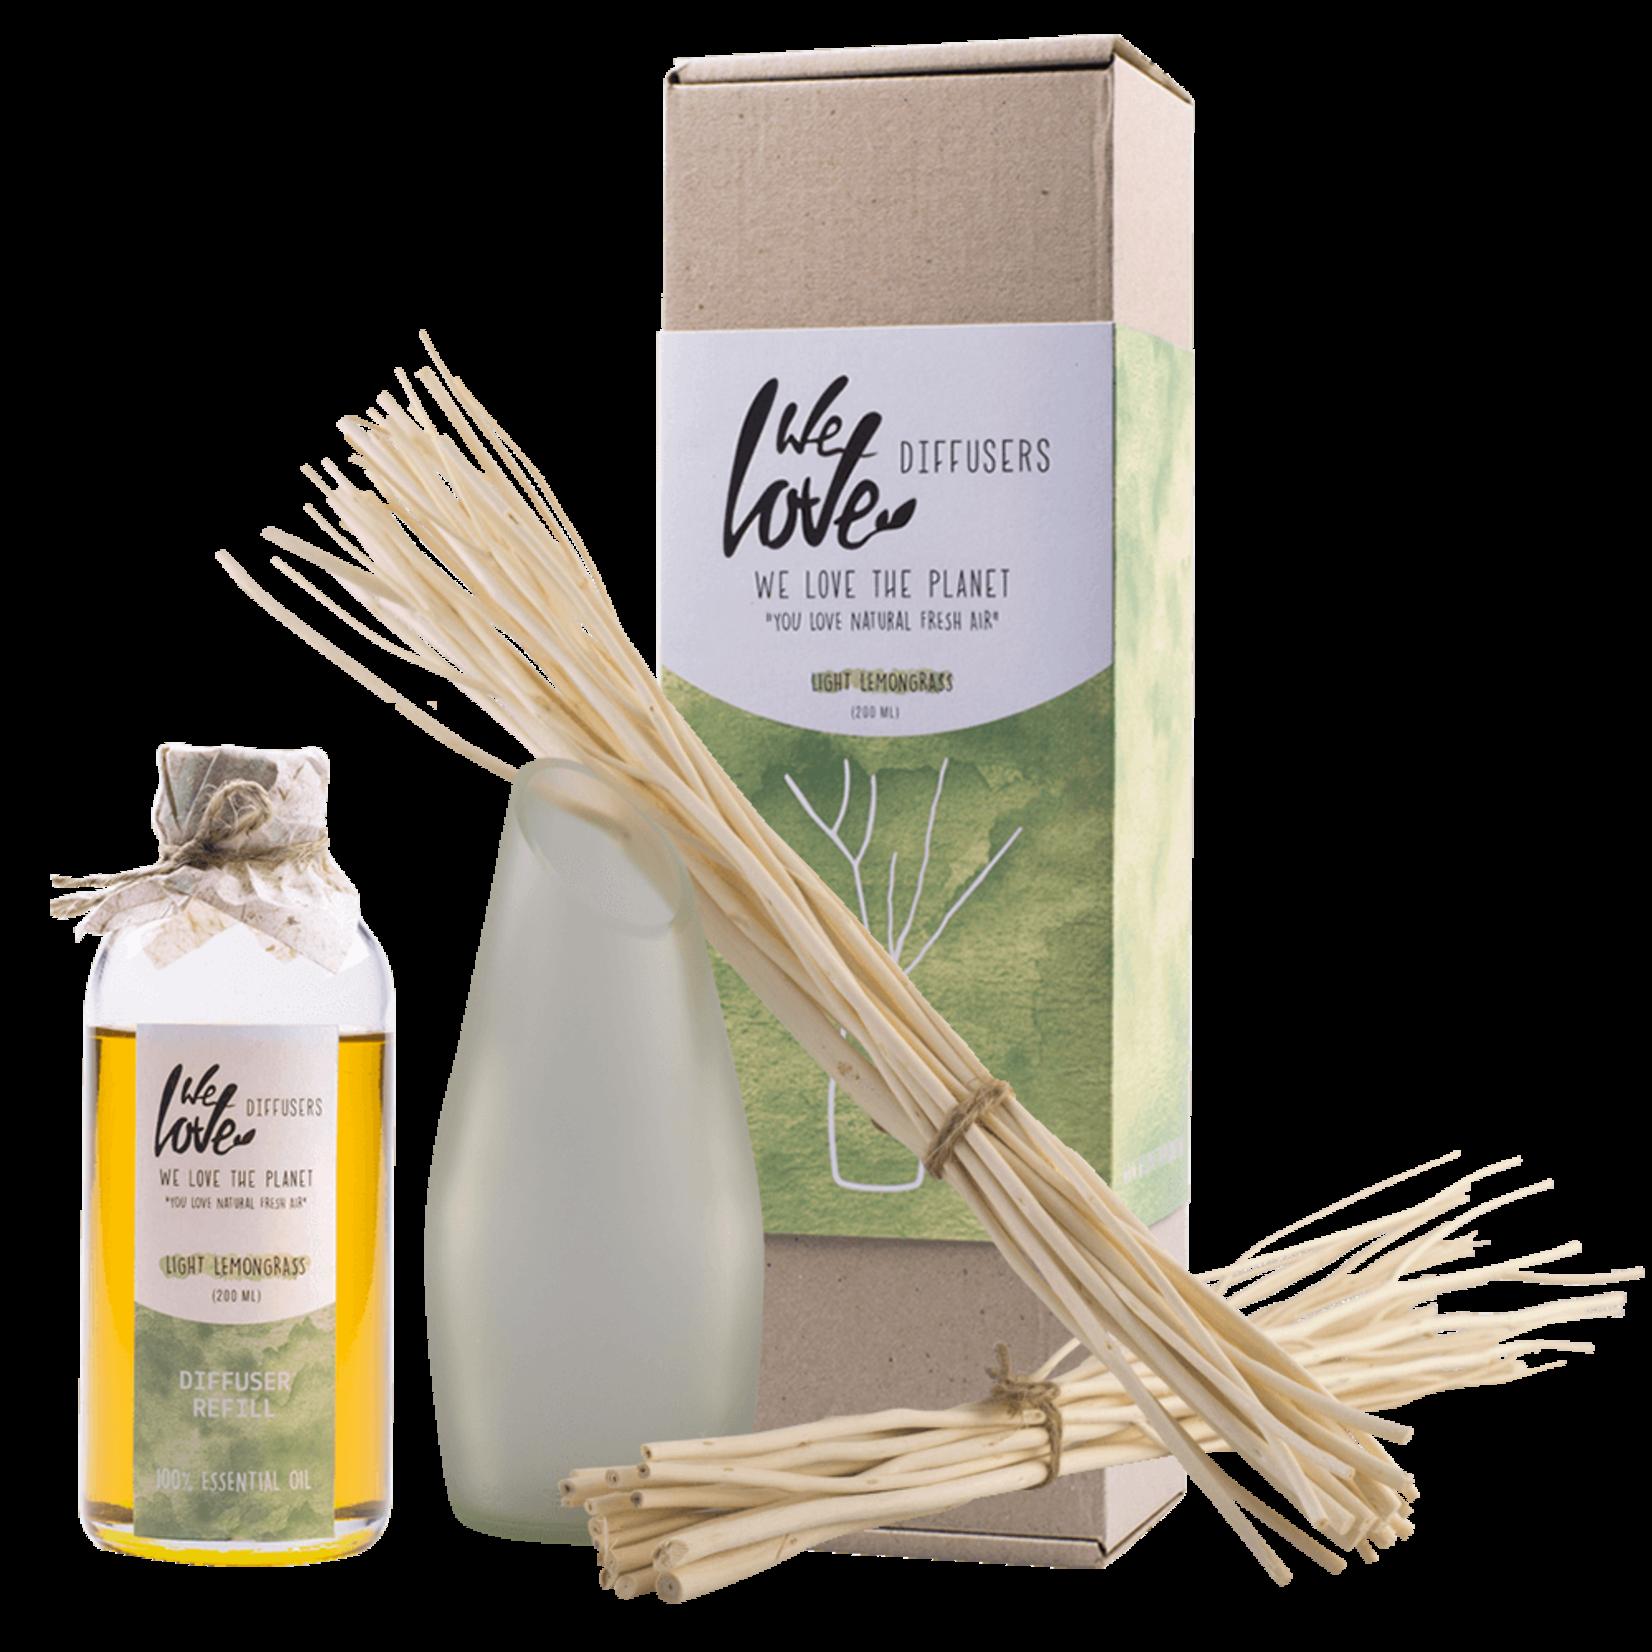 Diffuser set 200ml (essential oil) Light Lemon Grass